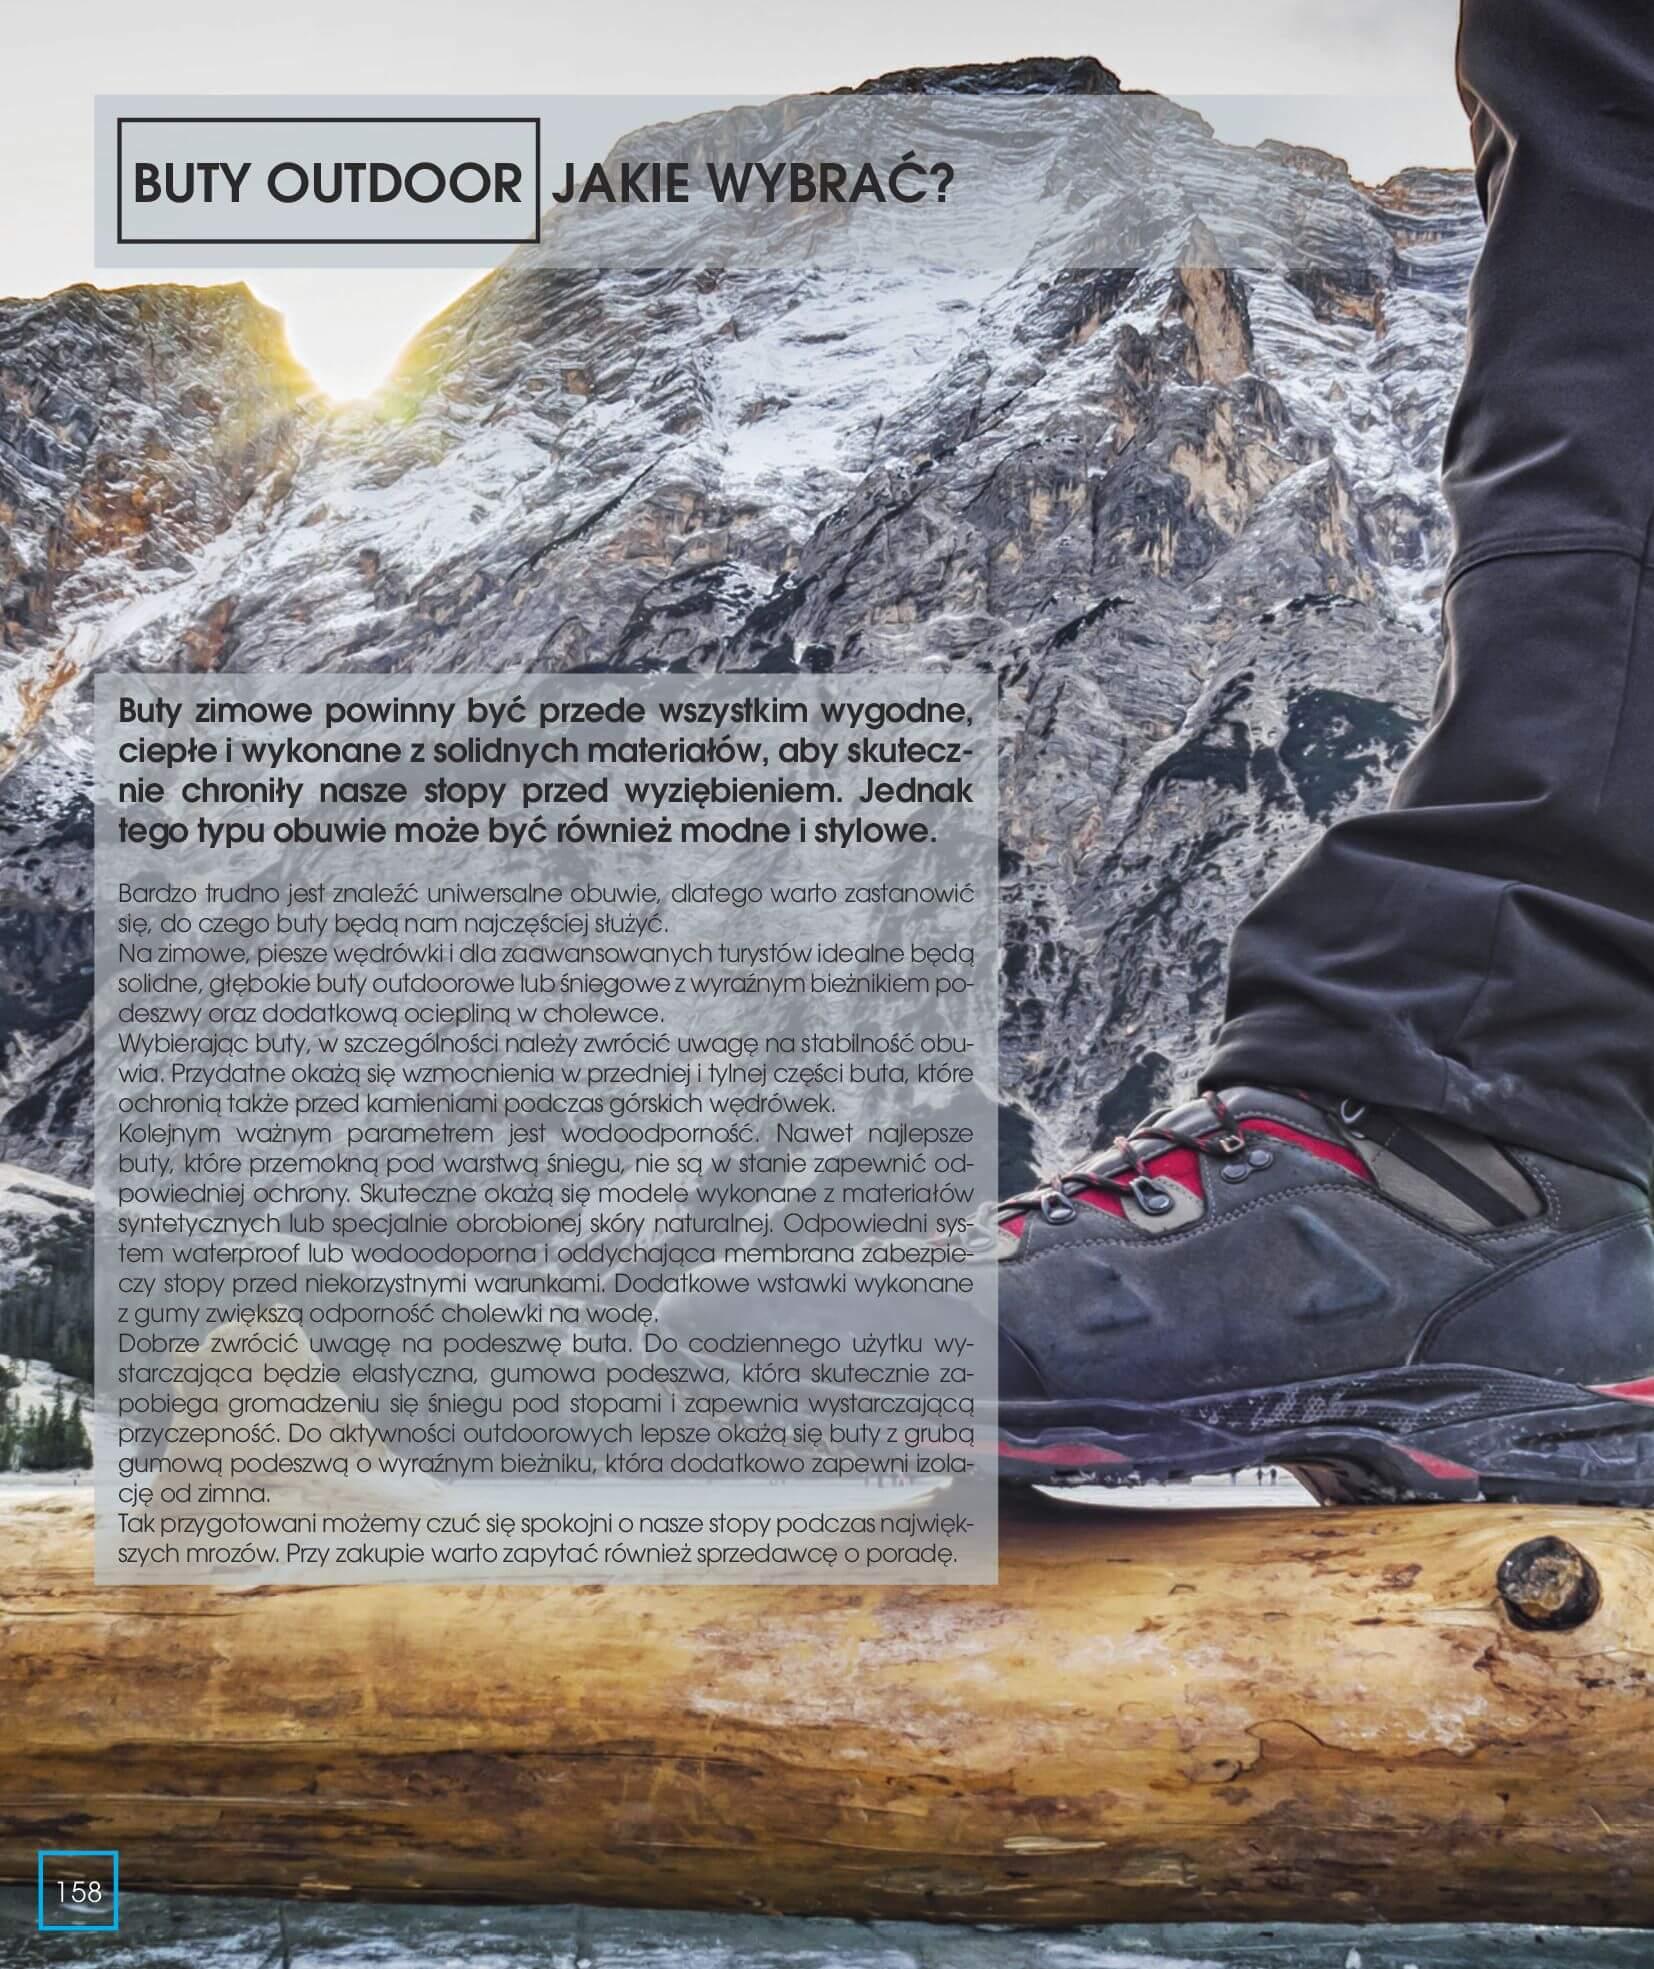 Gazetka Go Sport - Katalog Zima 2017/2018-12.11.2017-28.02.2018-page-158